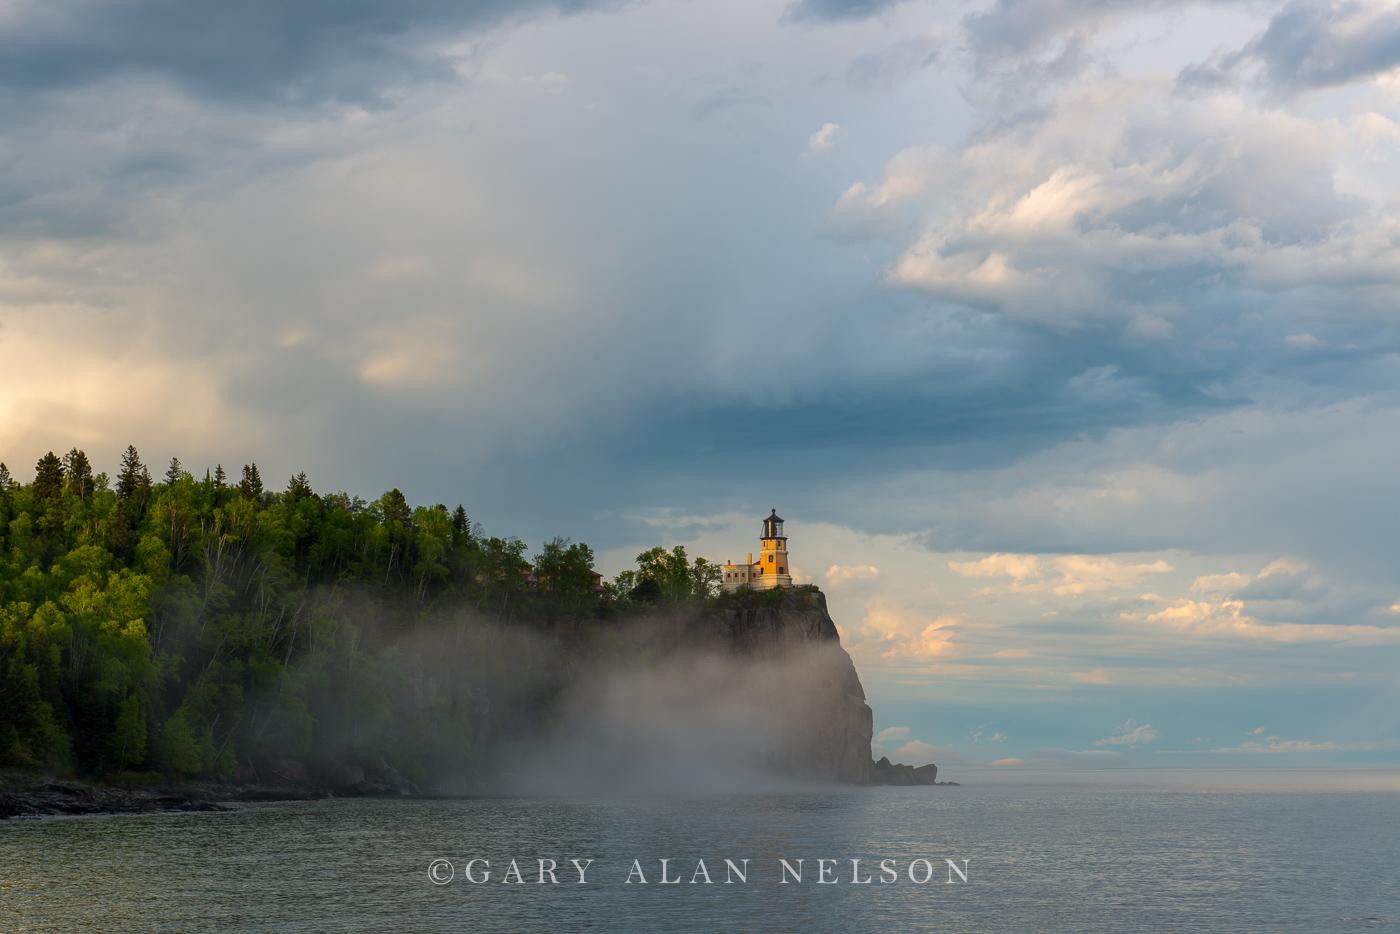 minnesota, lake superior, lighthouse, split rock, rainbow, clouds, fog, photo